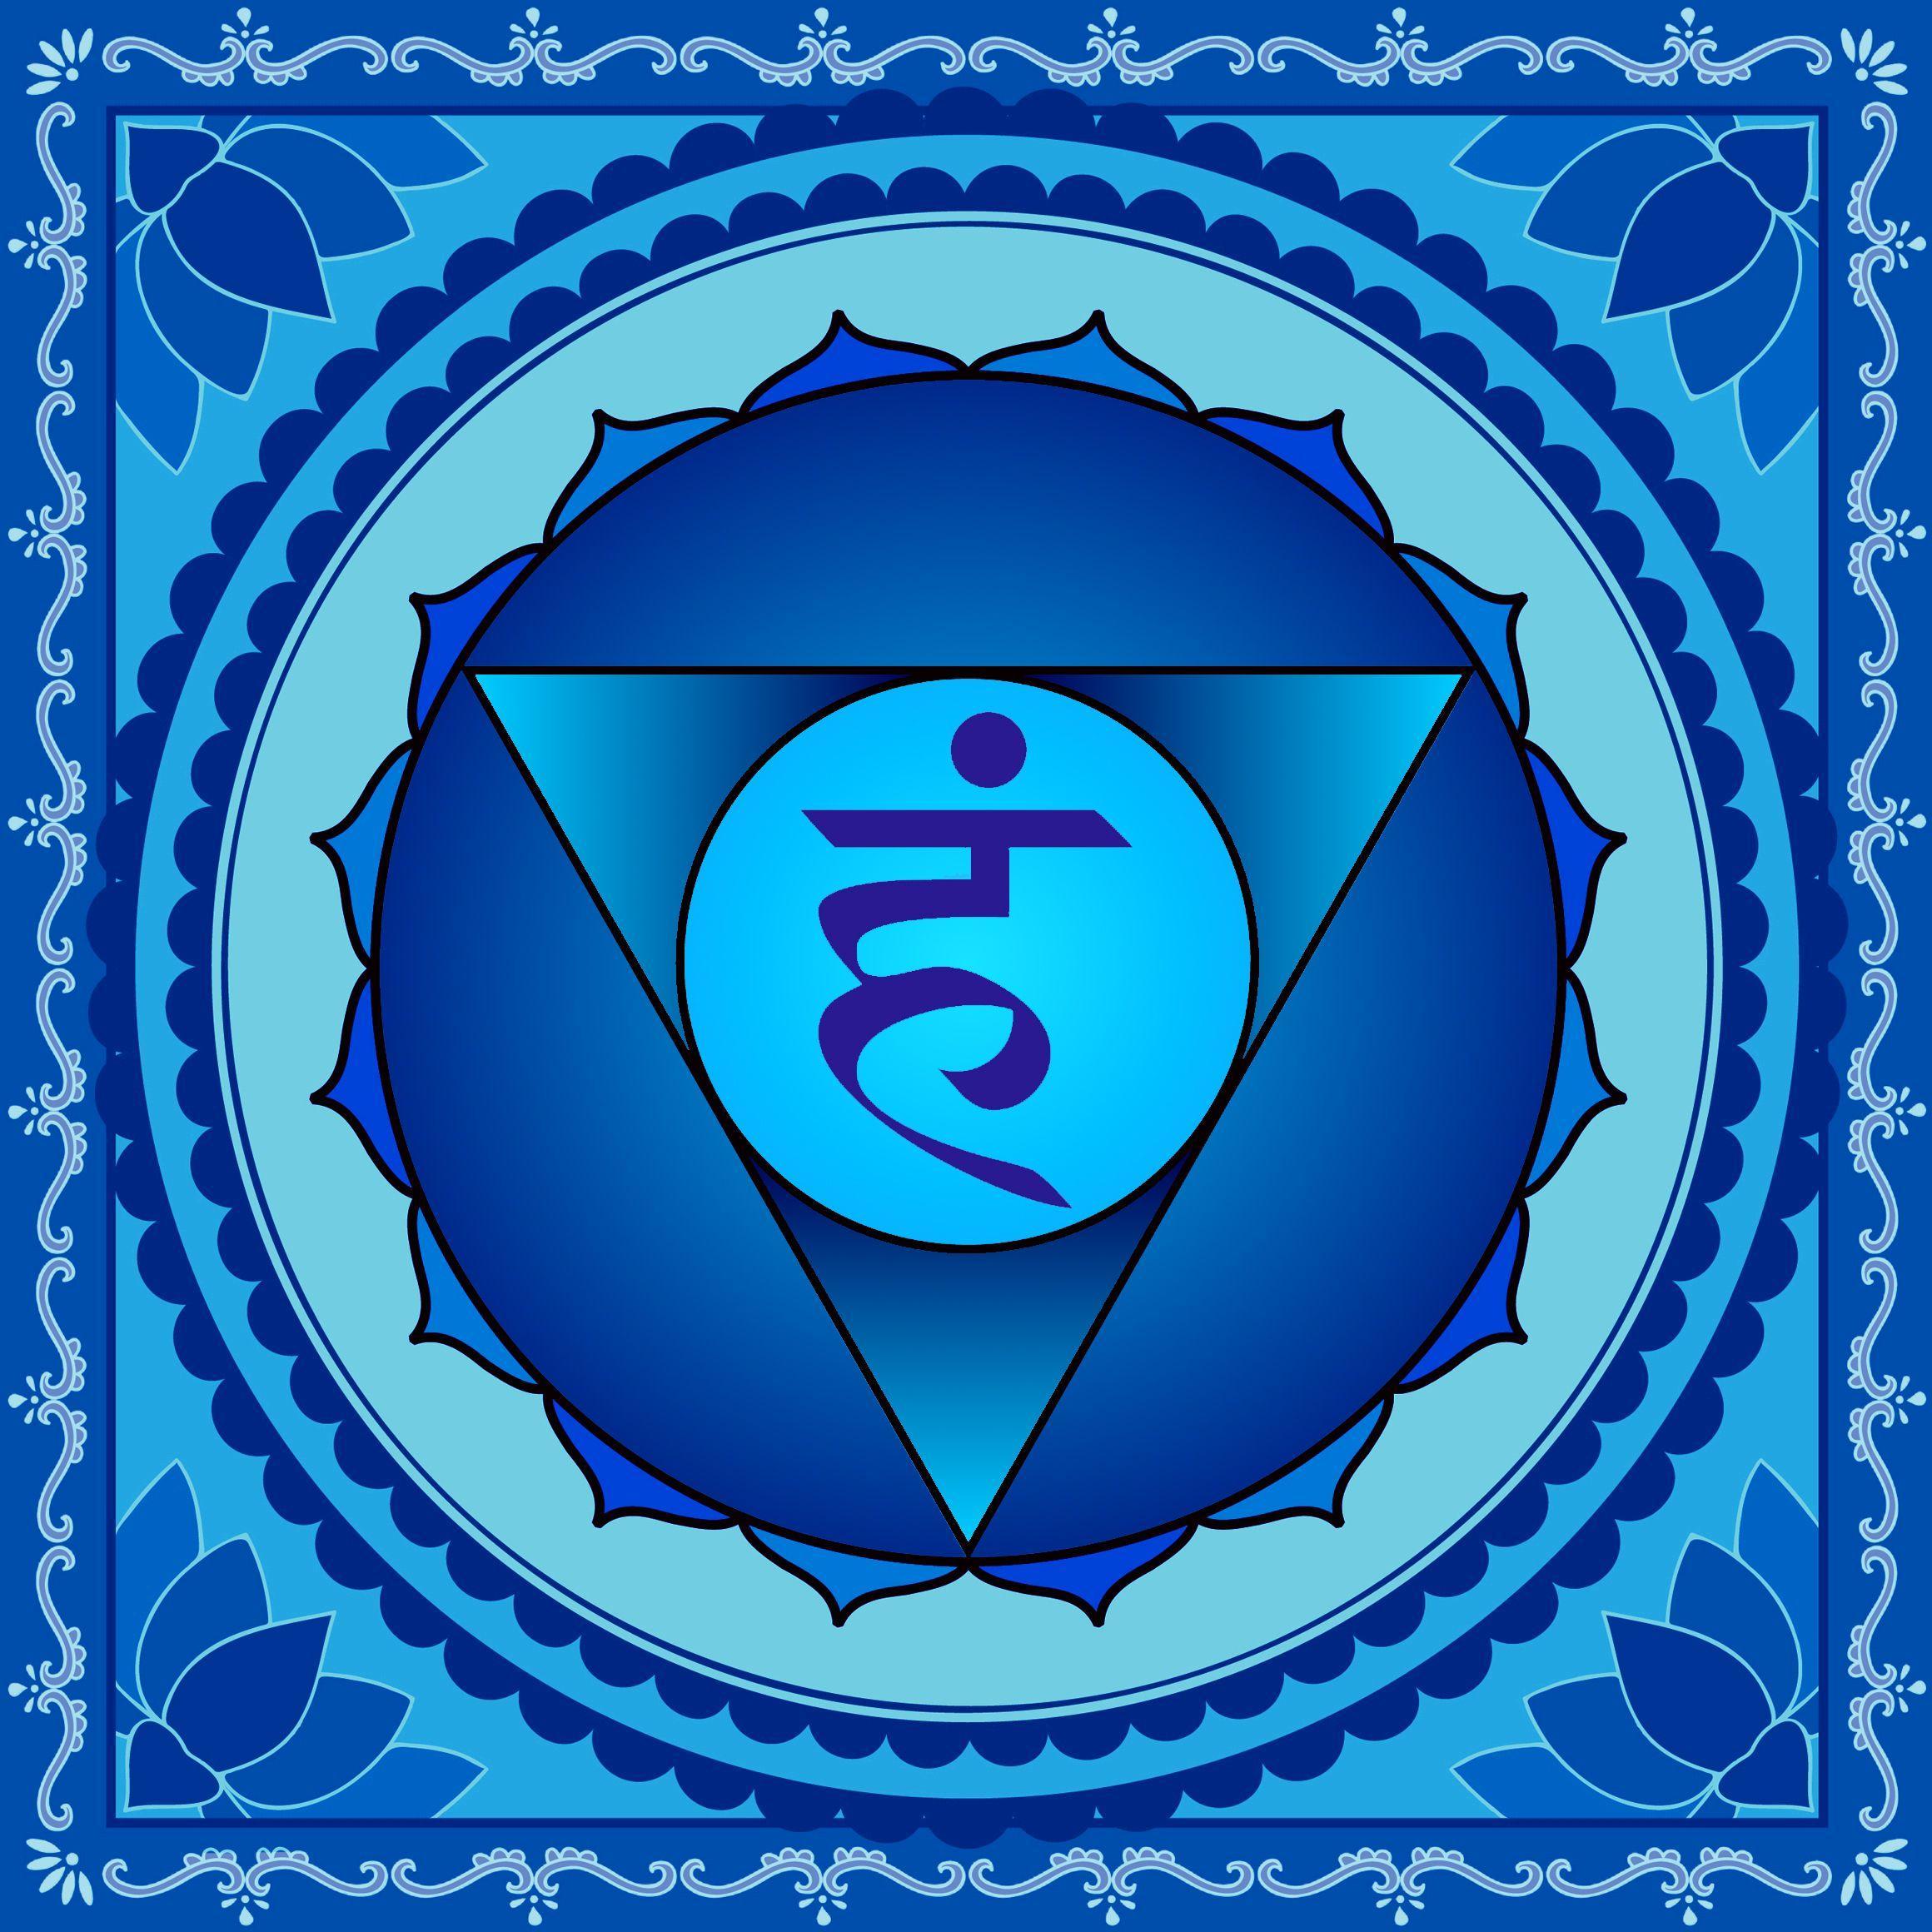 Decorative blue artwork